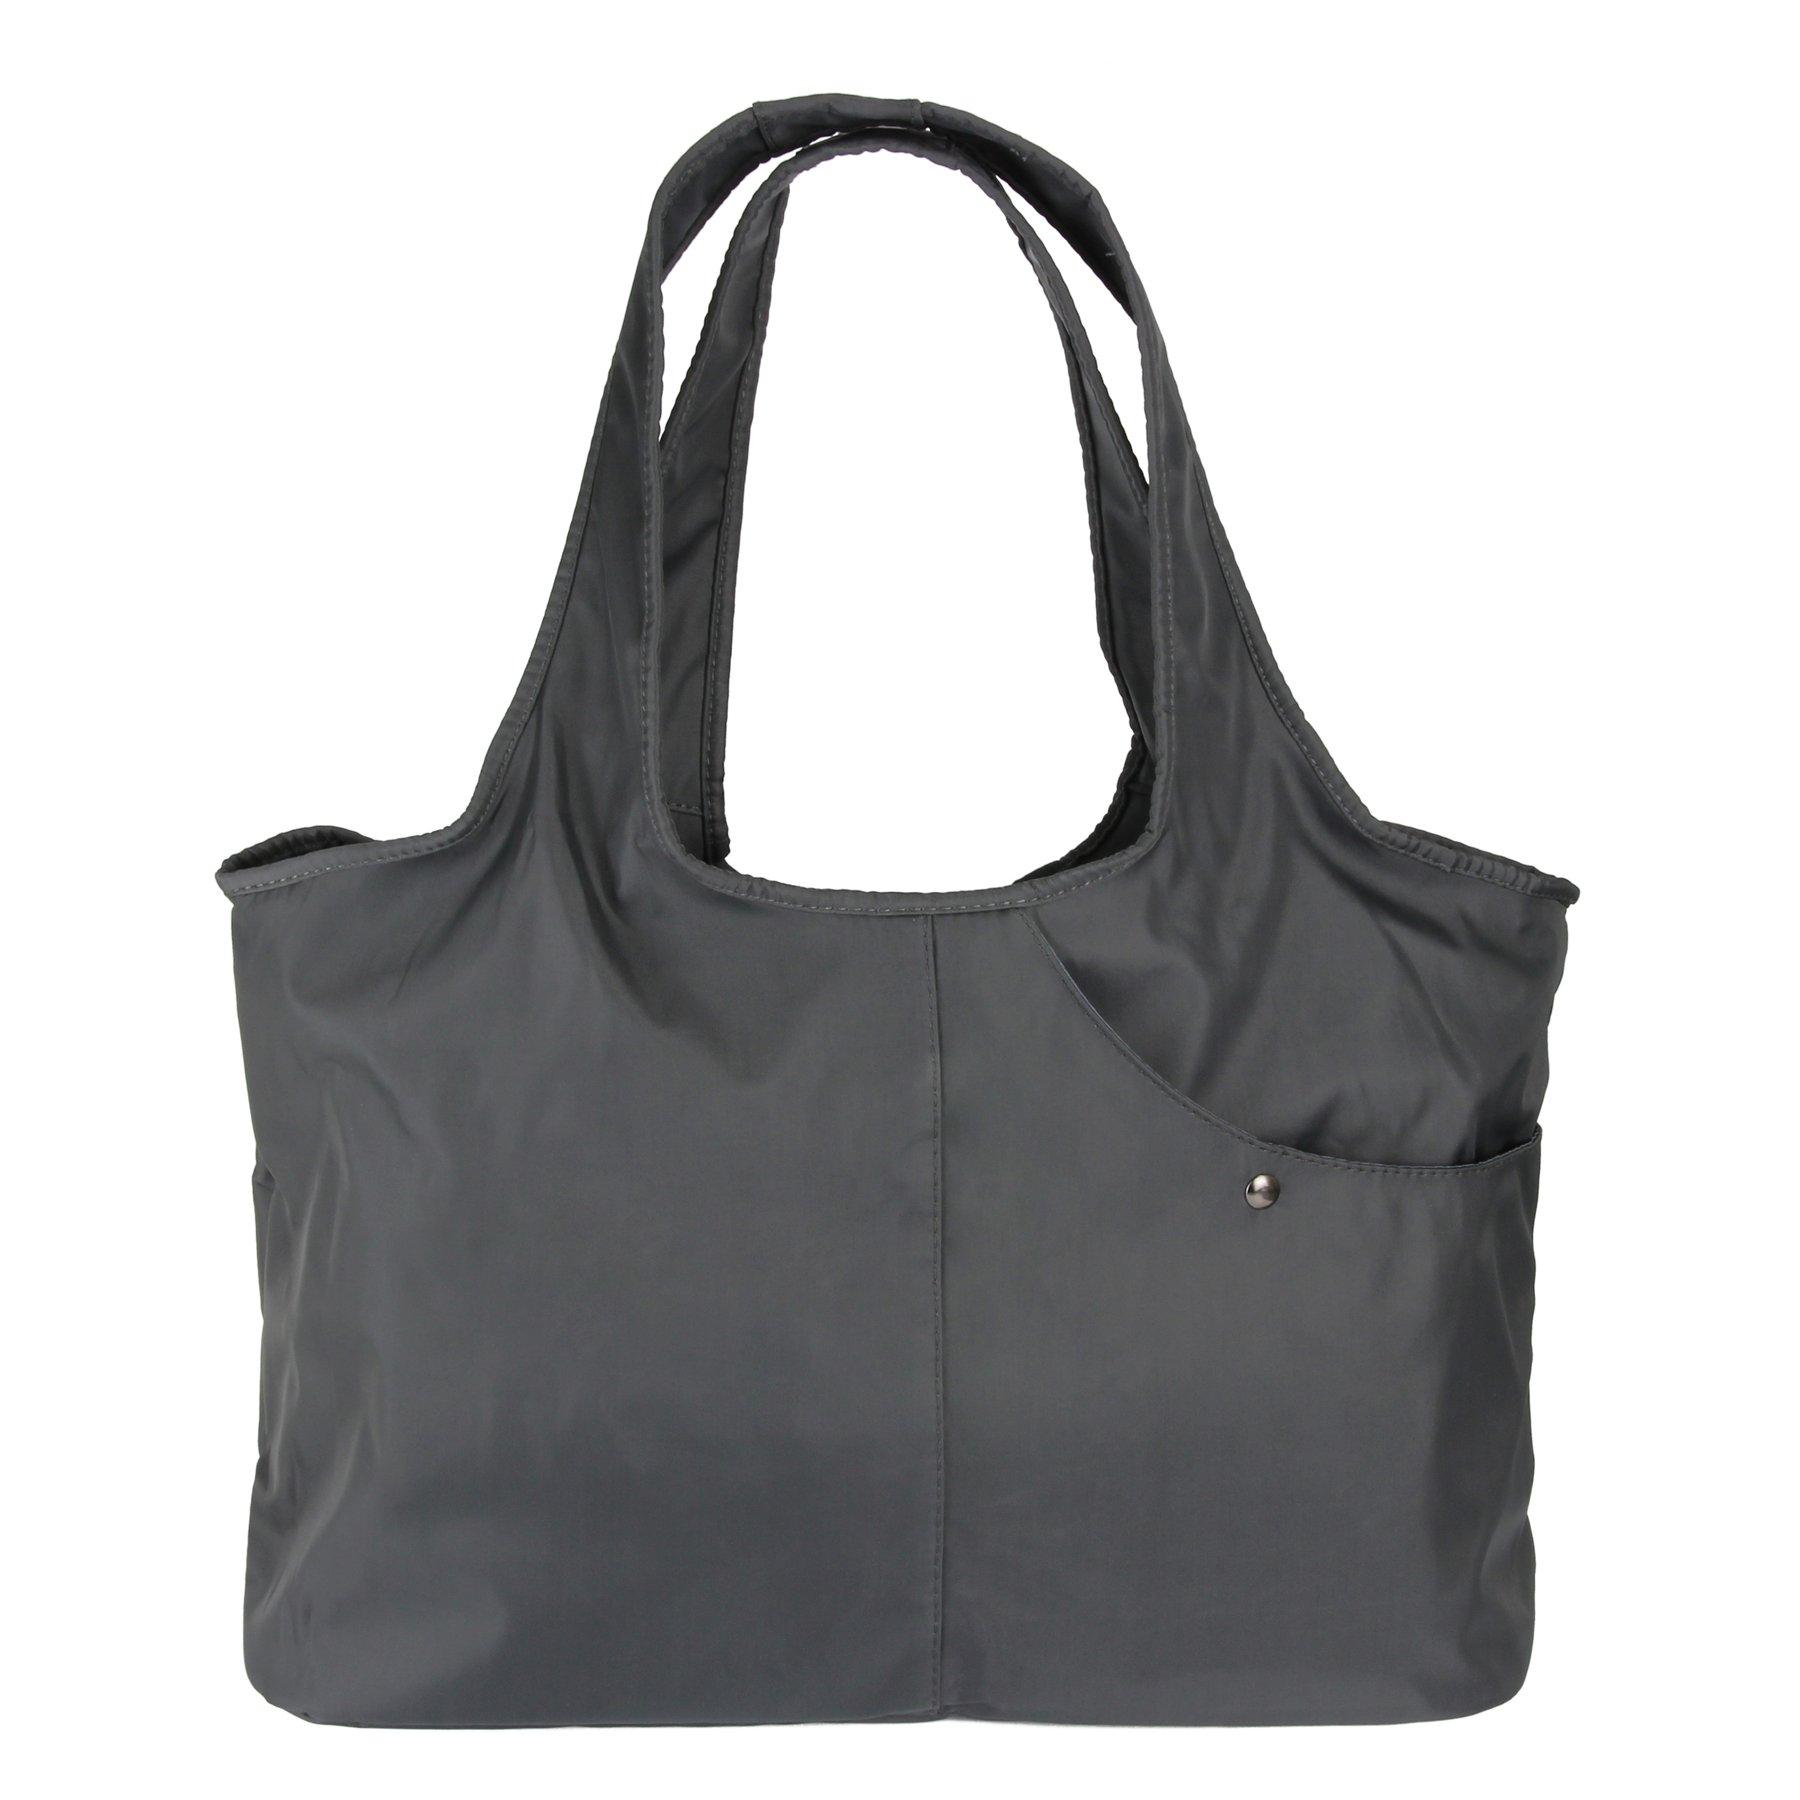 ZOOEASS Women Fashion Large Tote Shoulder Handbag Waterproof Tote Bag Multi-function Nylon Travel Shoulder